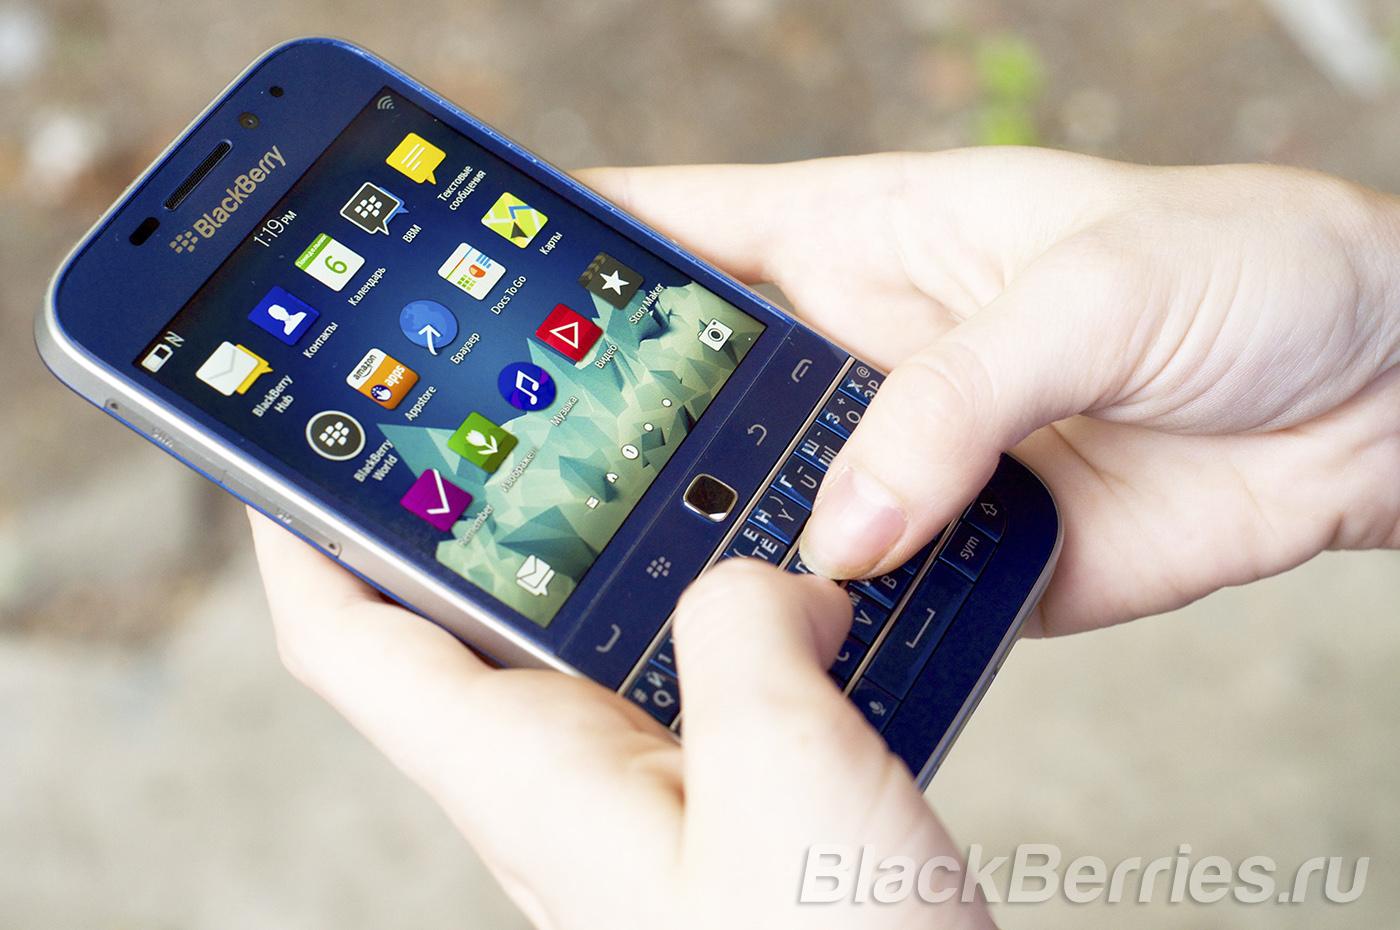 BlackBerry-Classic-Blue-Rus-5